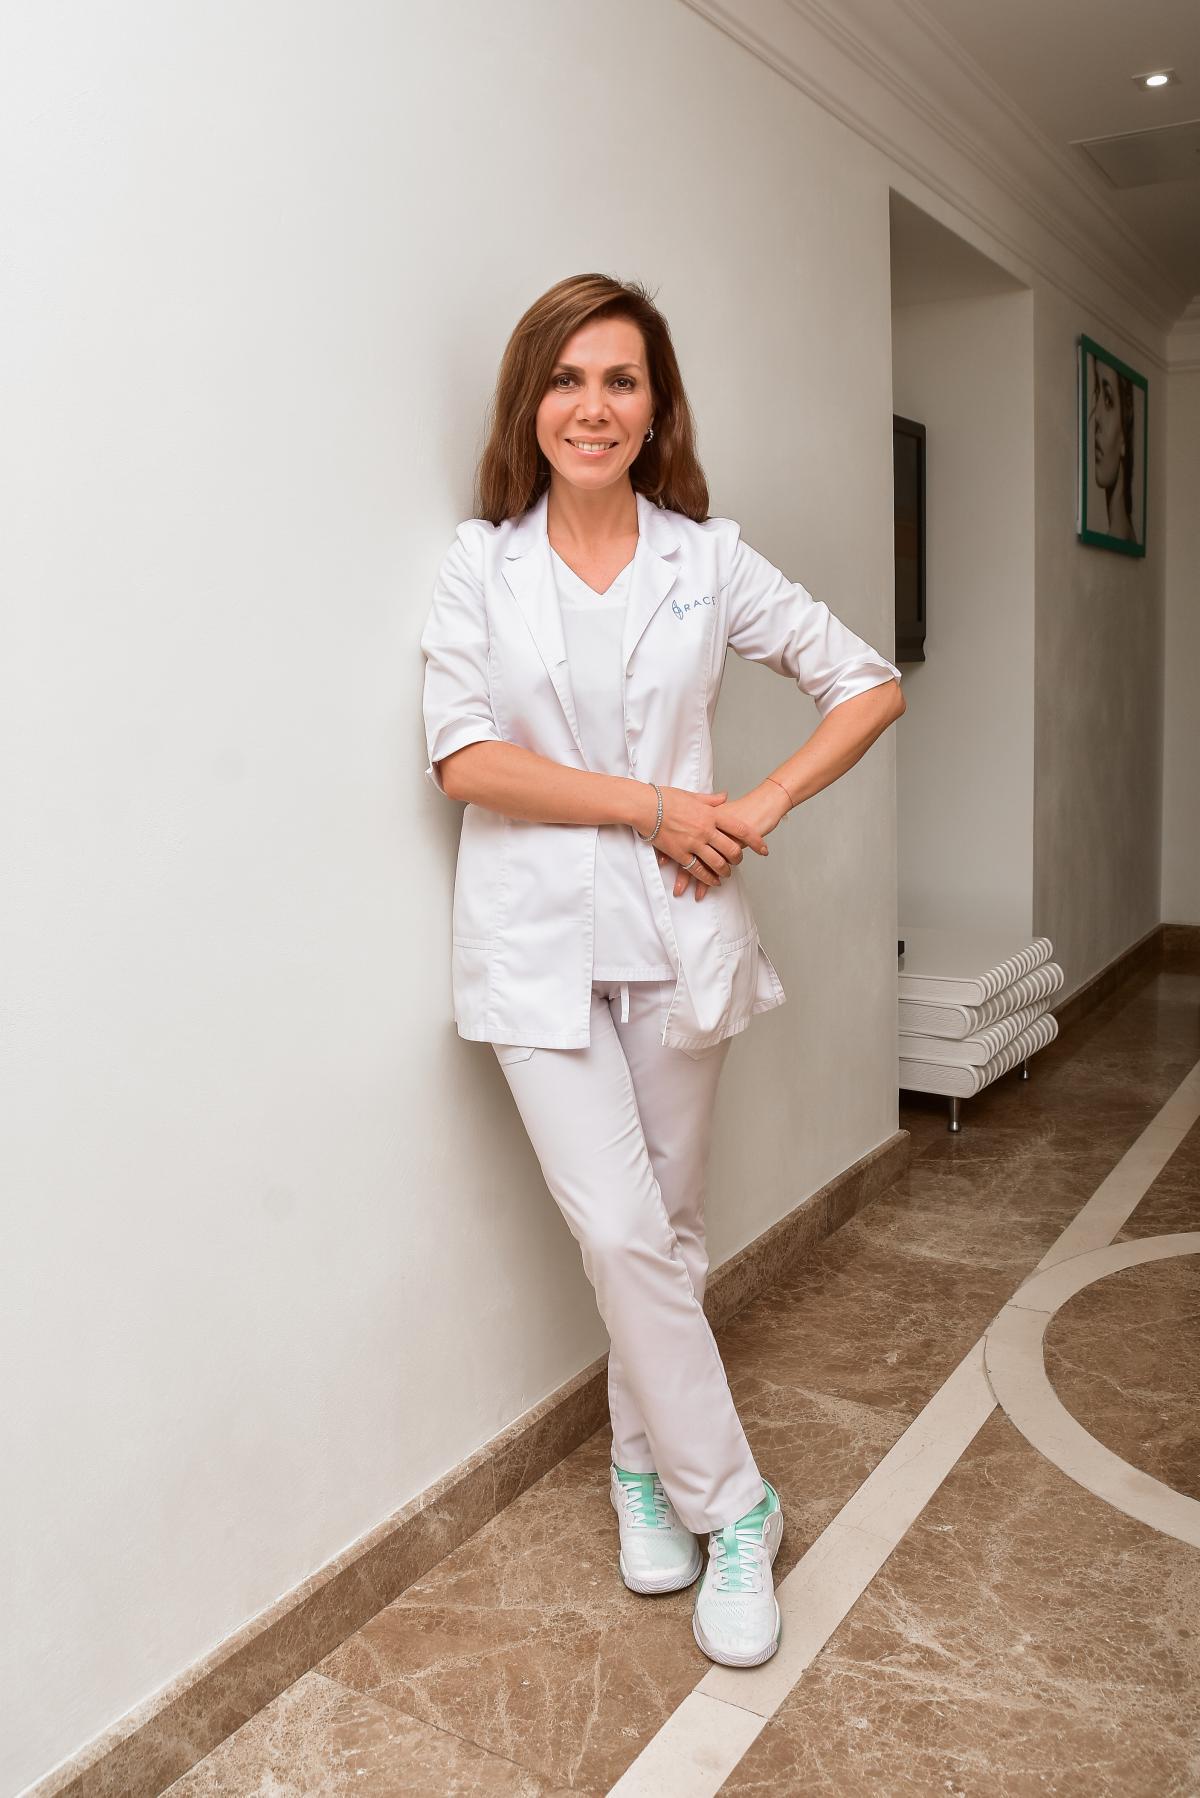 Гинеколог Татьяна Шевчук / фото instagram.com/gynecologist_shevchuk